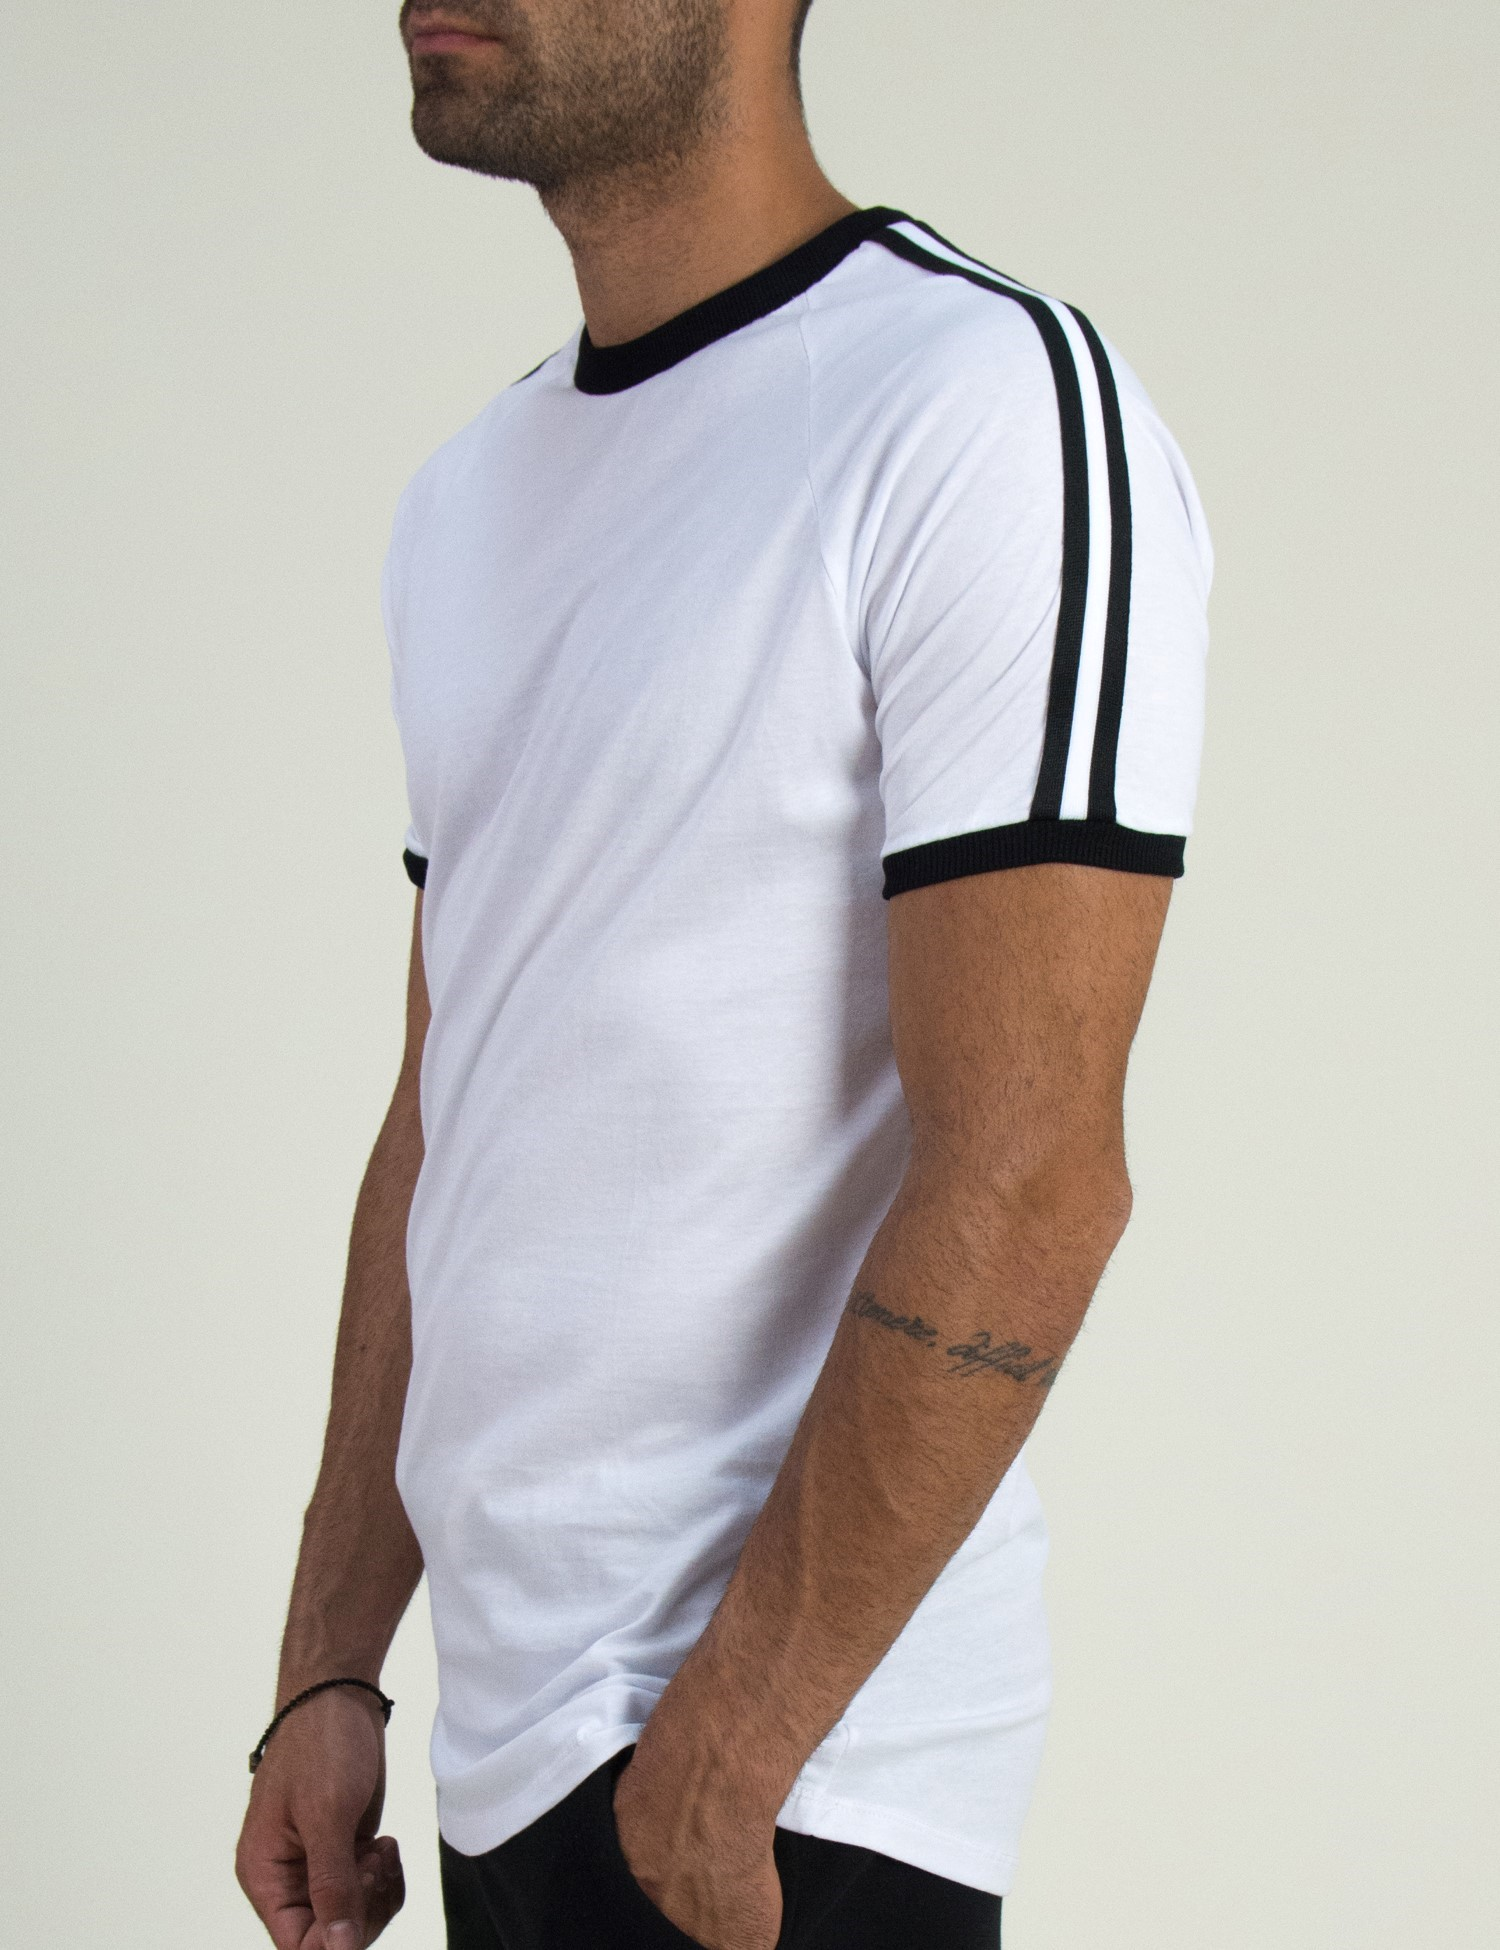 035ef7a9fd05 Ανδρική λευκή κοντομάνικη μπλούζα Ben Tailor με ρίγες 1307